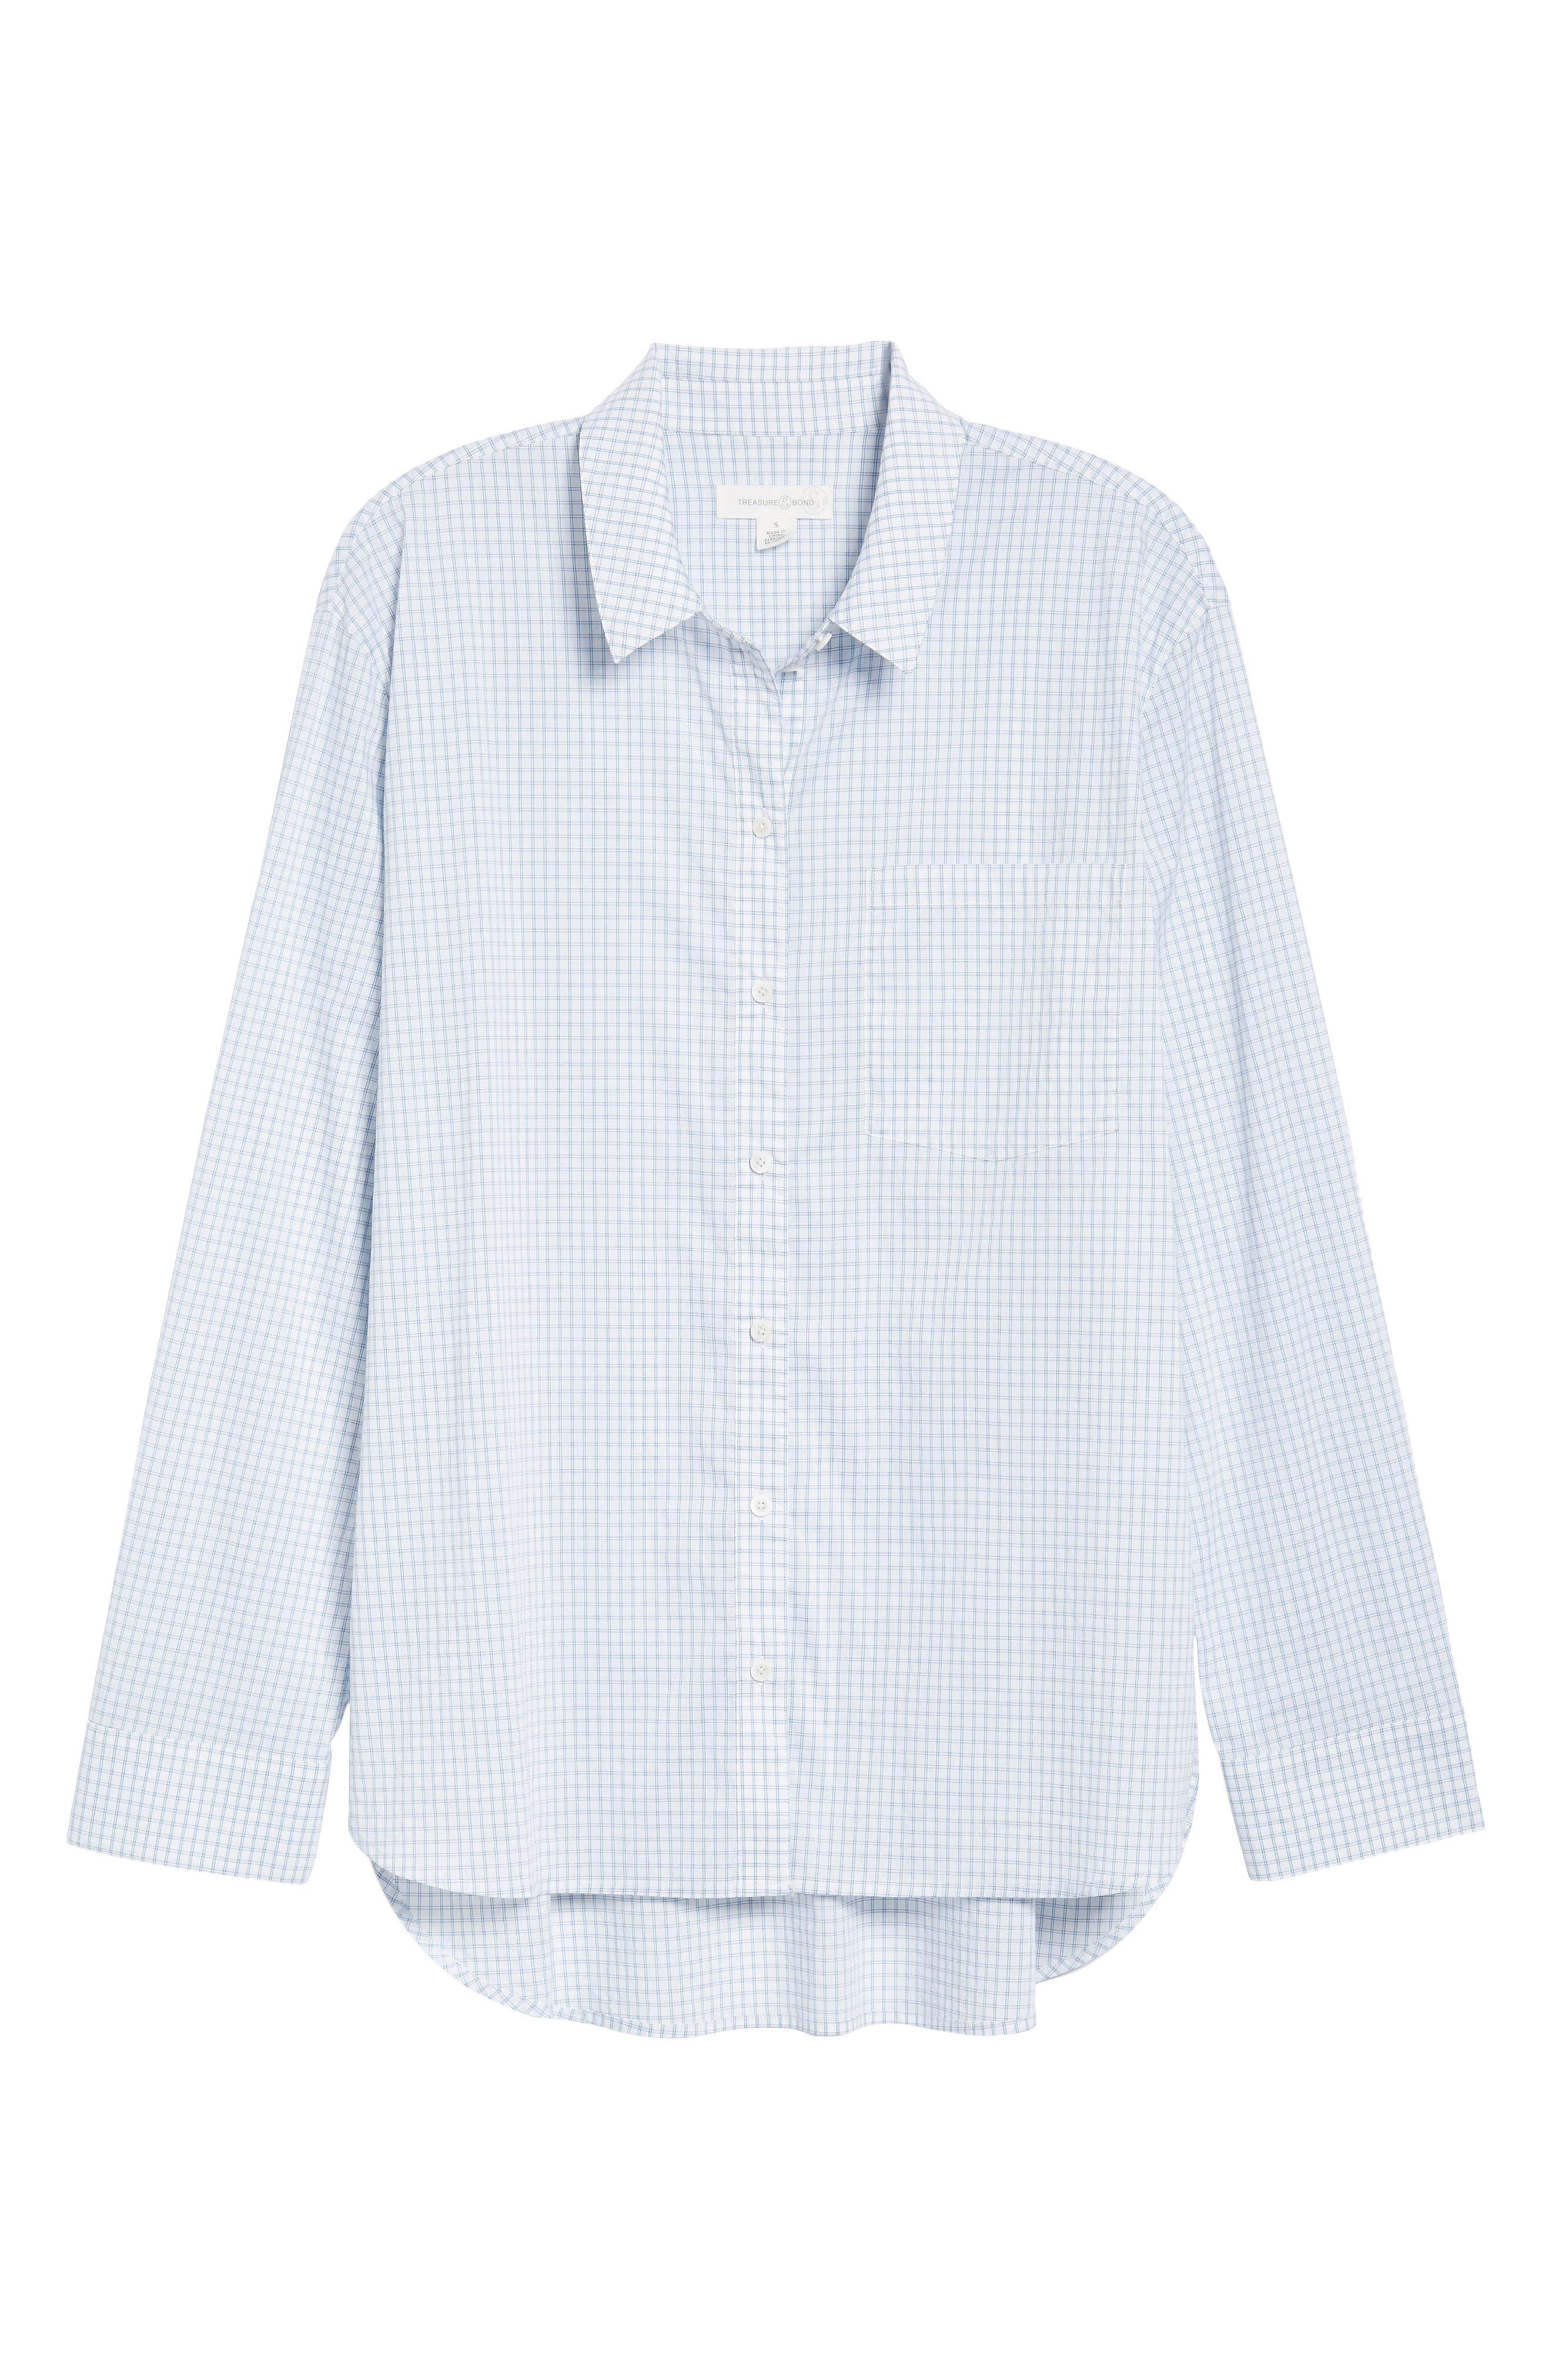 Oversize Check Shirt,                             Alternate thumbnail 6, color,                             100